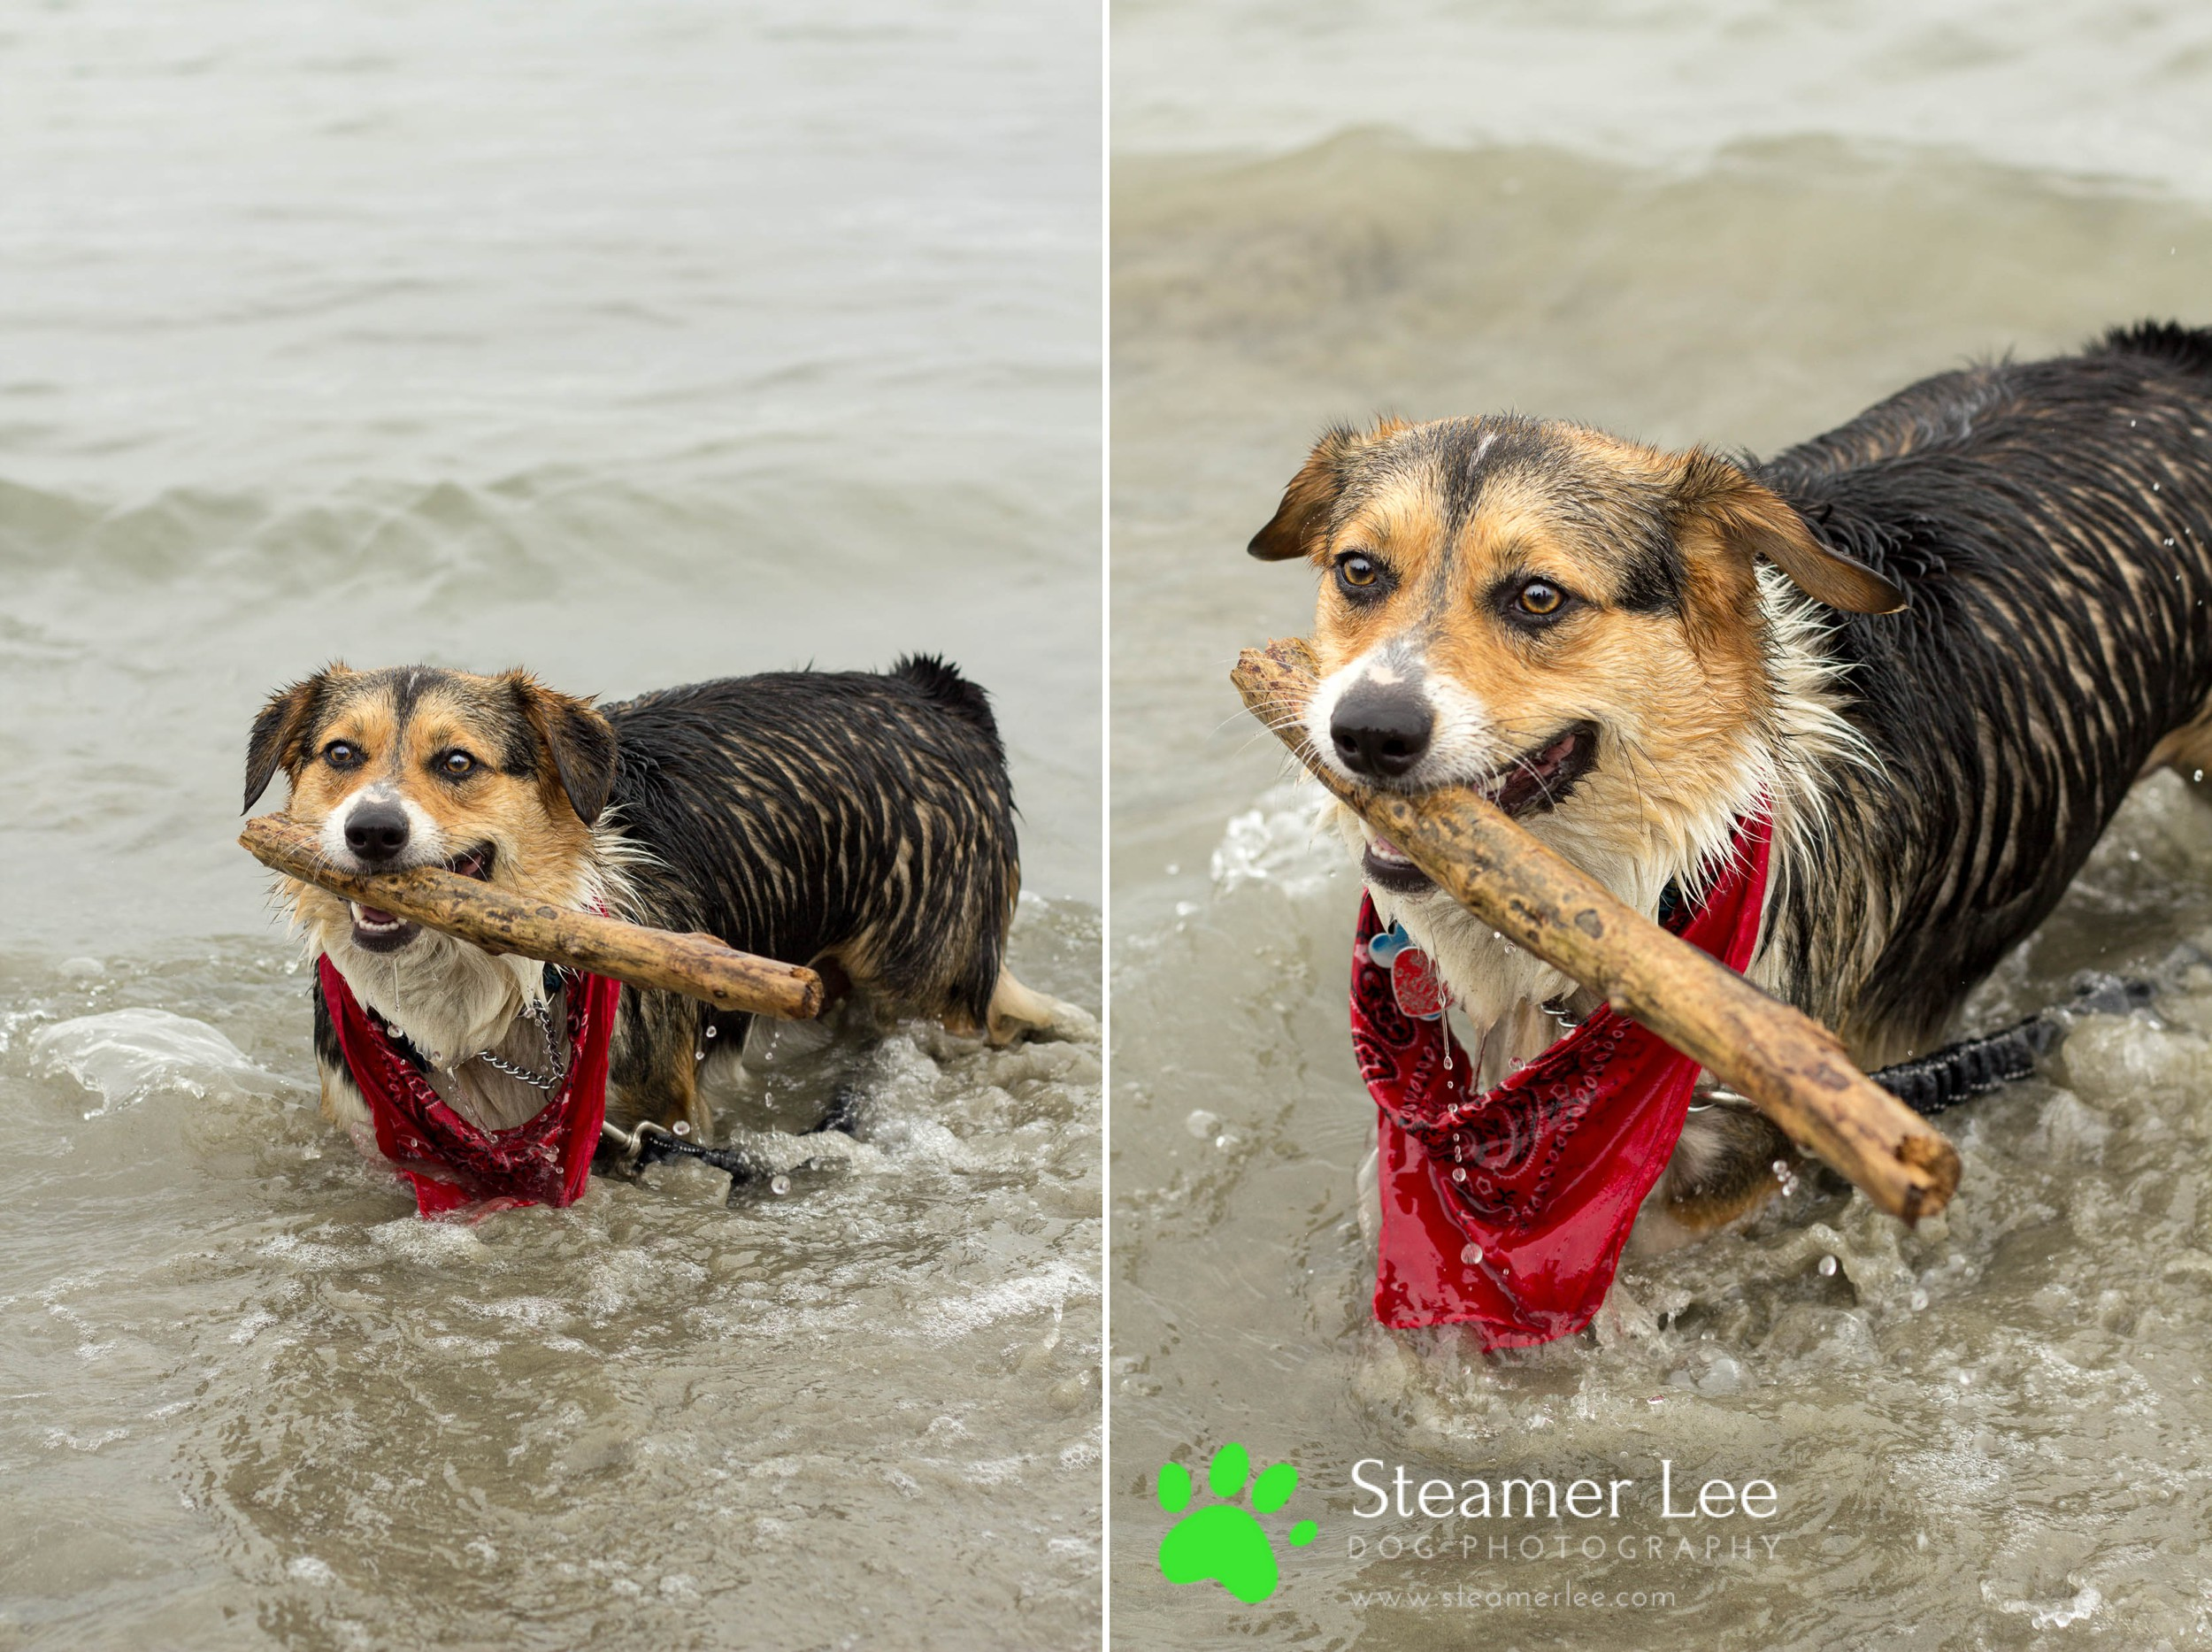 Steamer Lee Dog Photography - July 2017 So Cal Corgi Beach Day - Vol.2 - 4.jpg